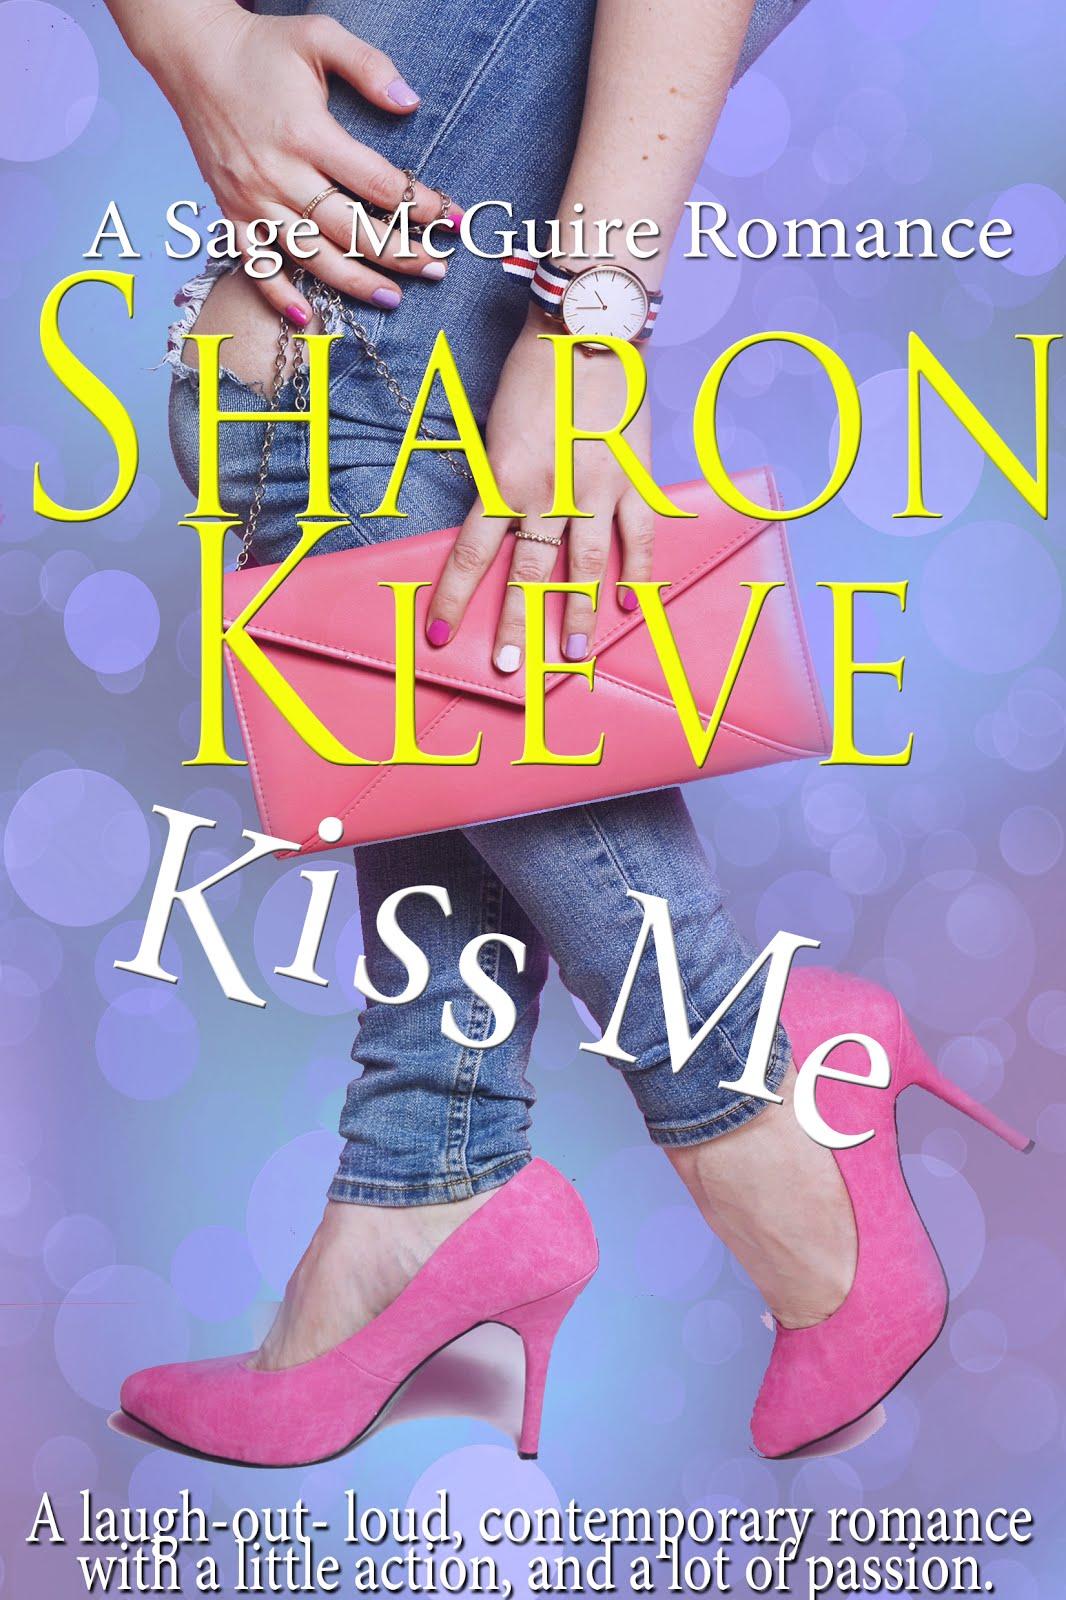 KISS ME - A SAGE MCGUIRE ROMANCE